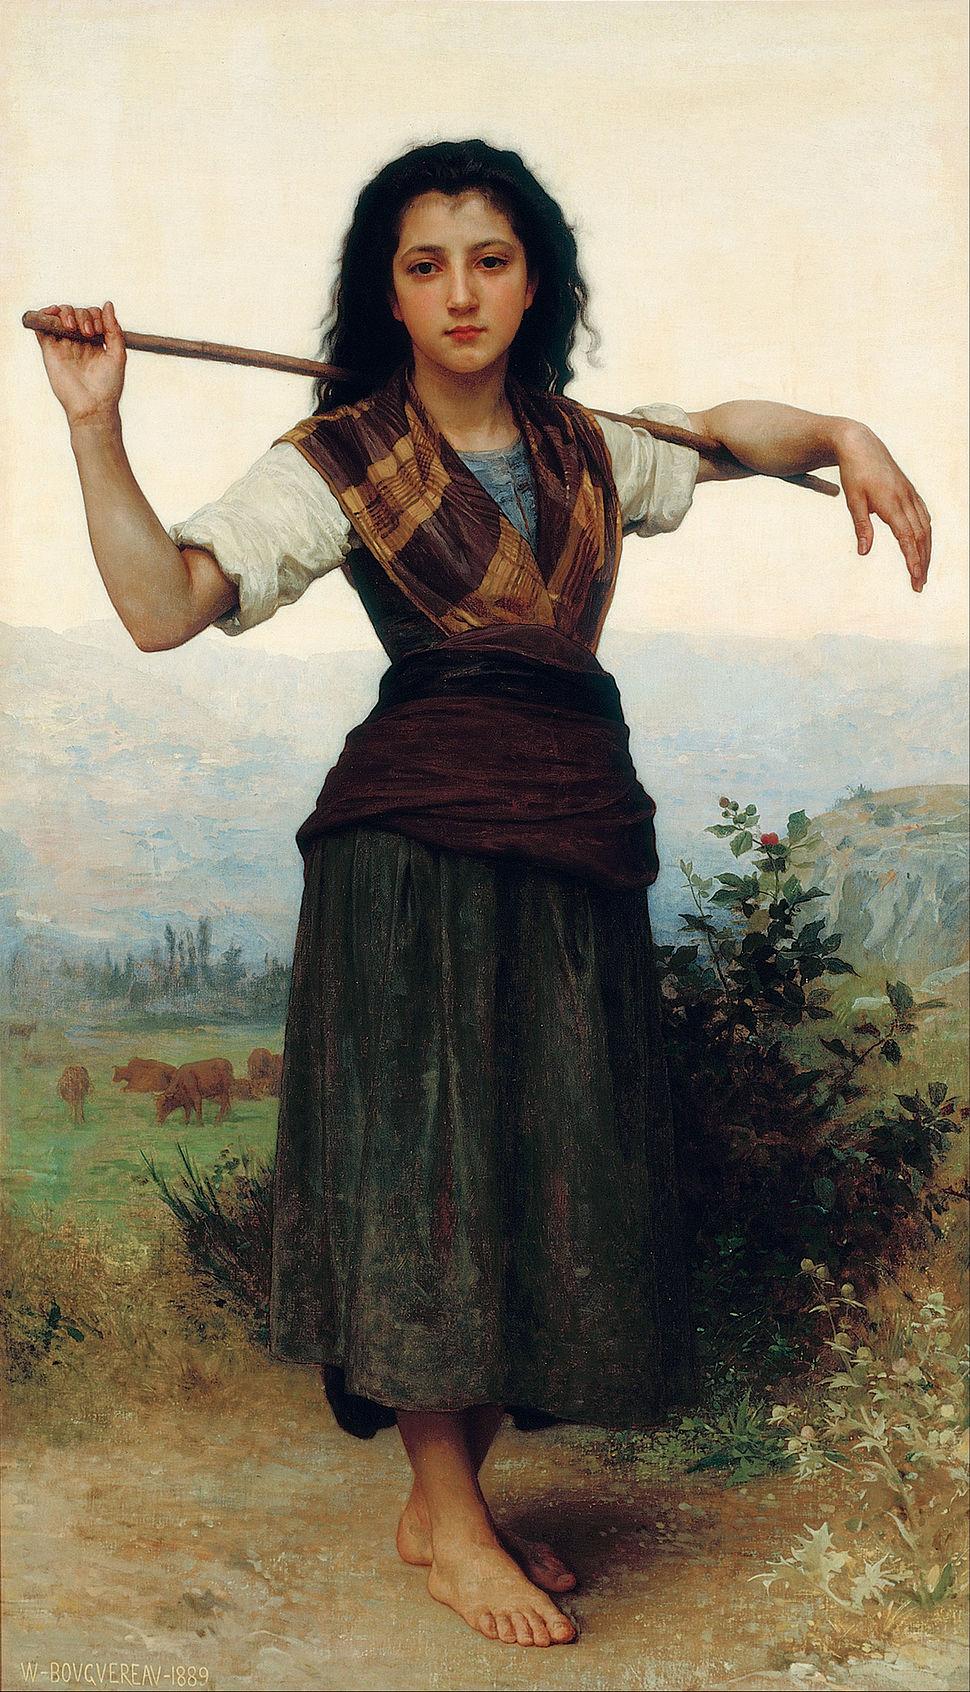 William-Adolphe Bouguereau - The Little Shepherdess - Google Art Project